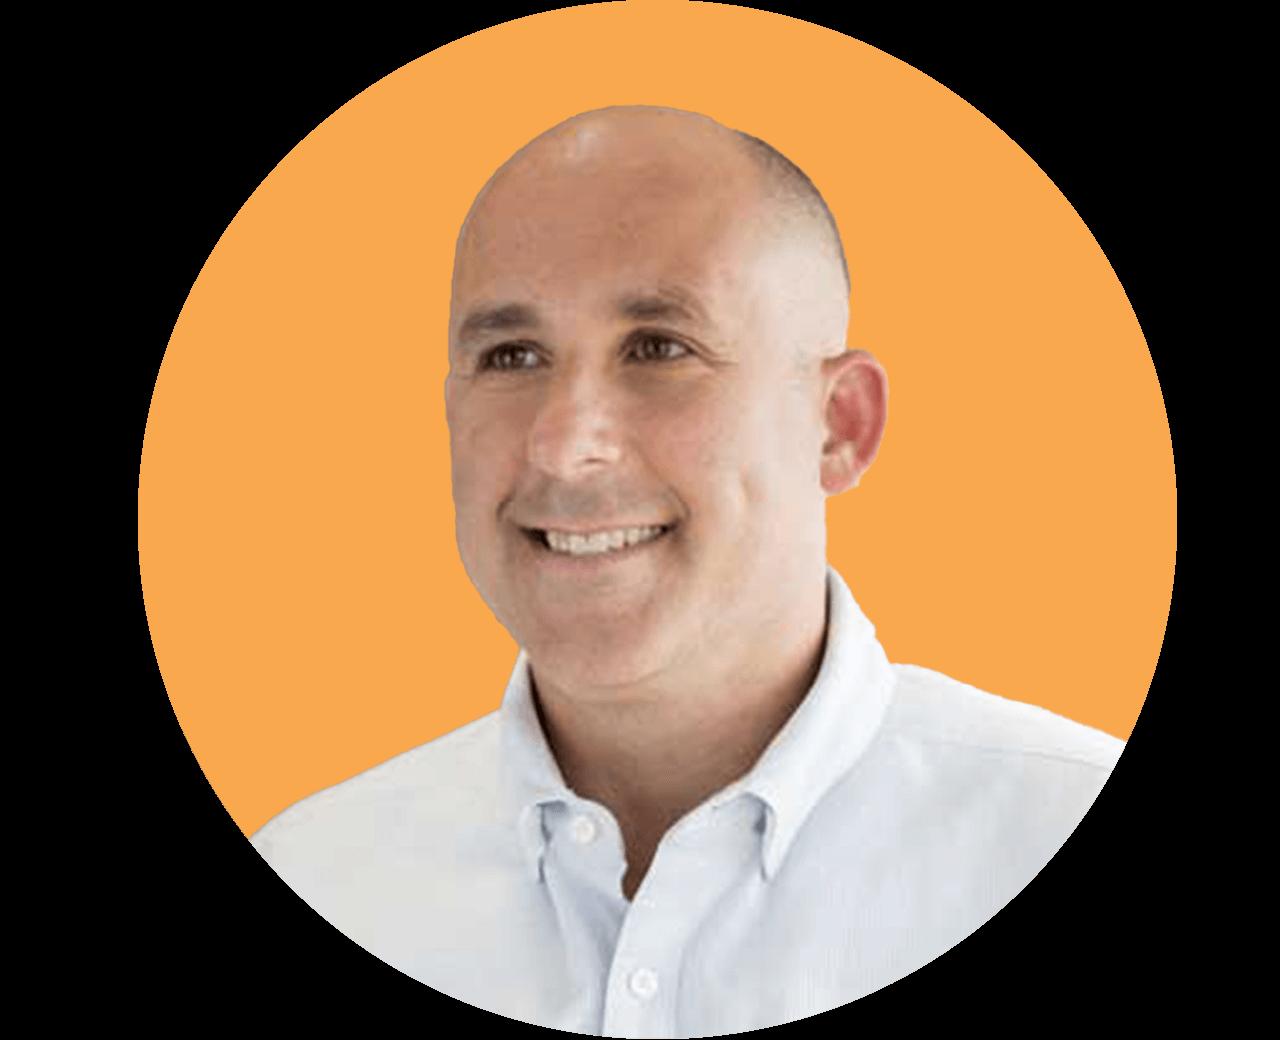 Scott Feldman Headshot